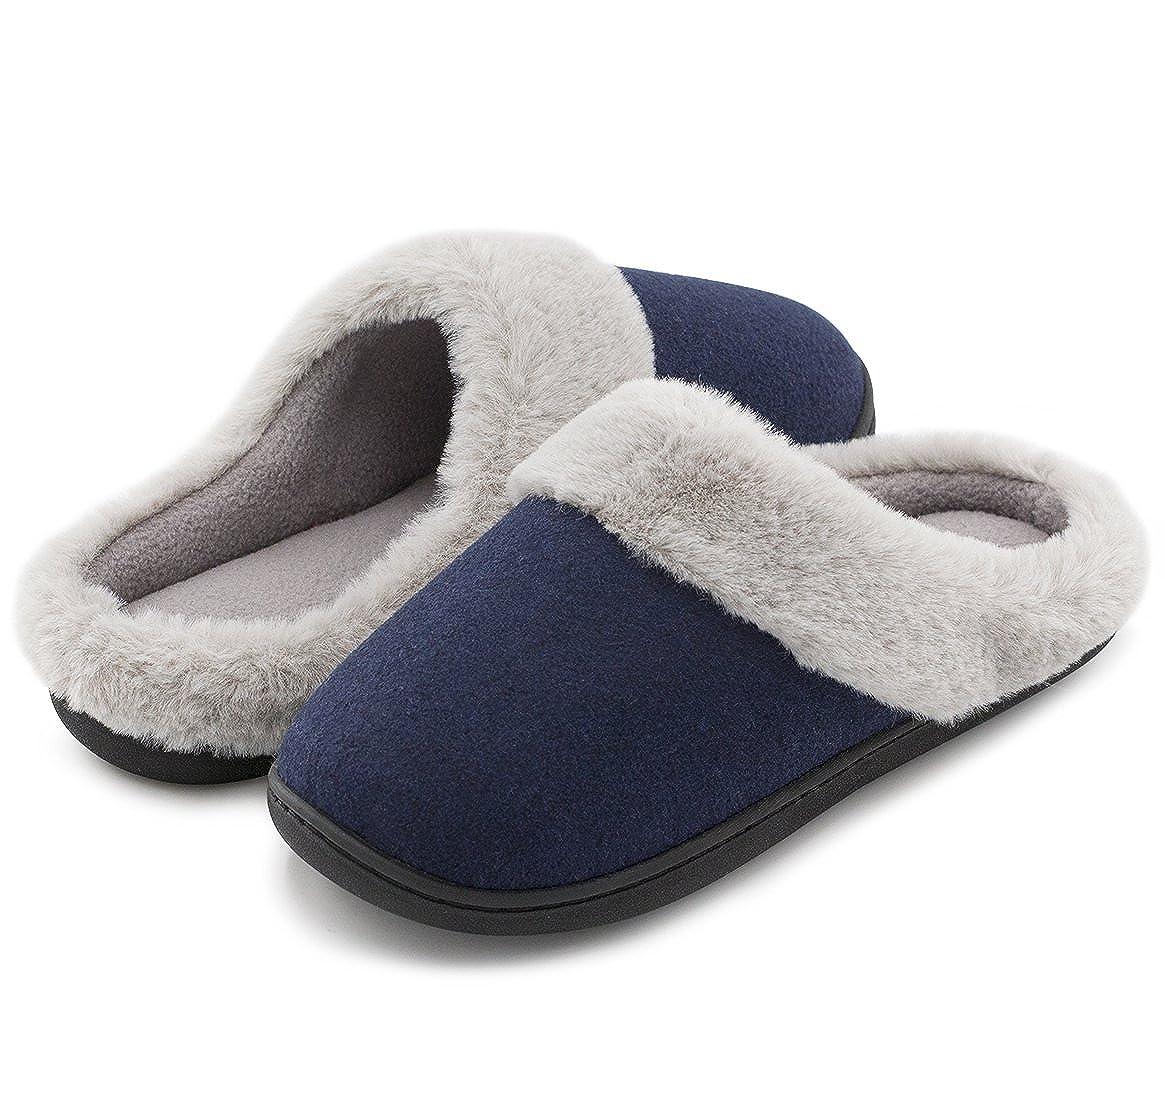 HomeIdeas Women's Woolen Fabric Memory Foam Anti Slip House Slippers Breathable Indoor Shoes